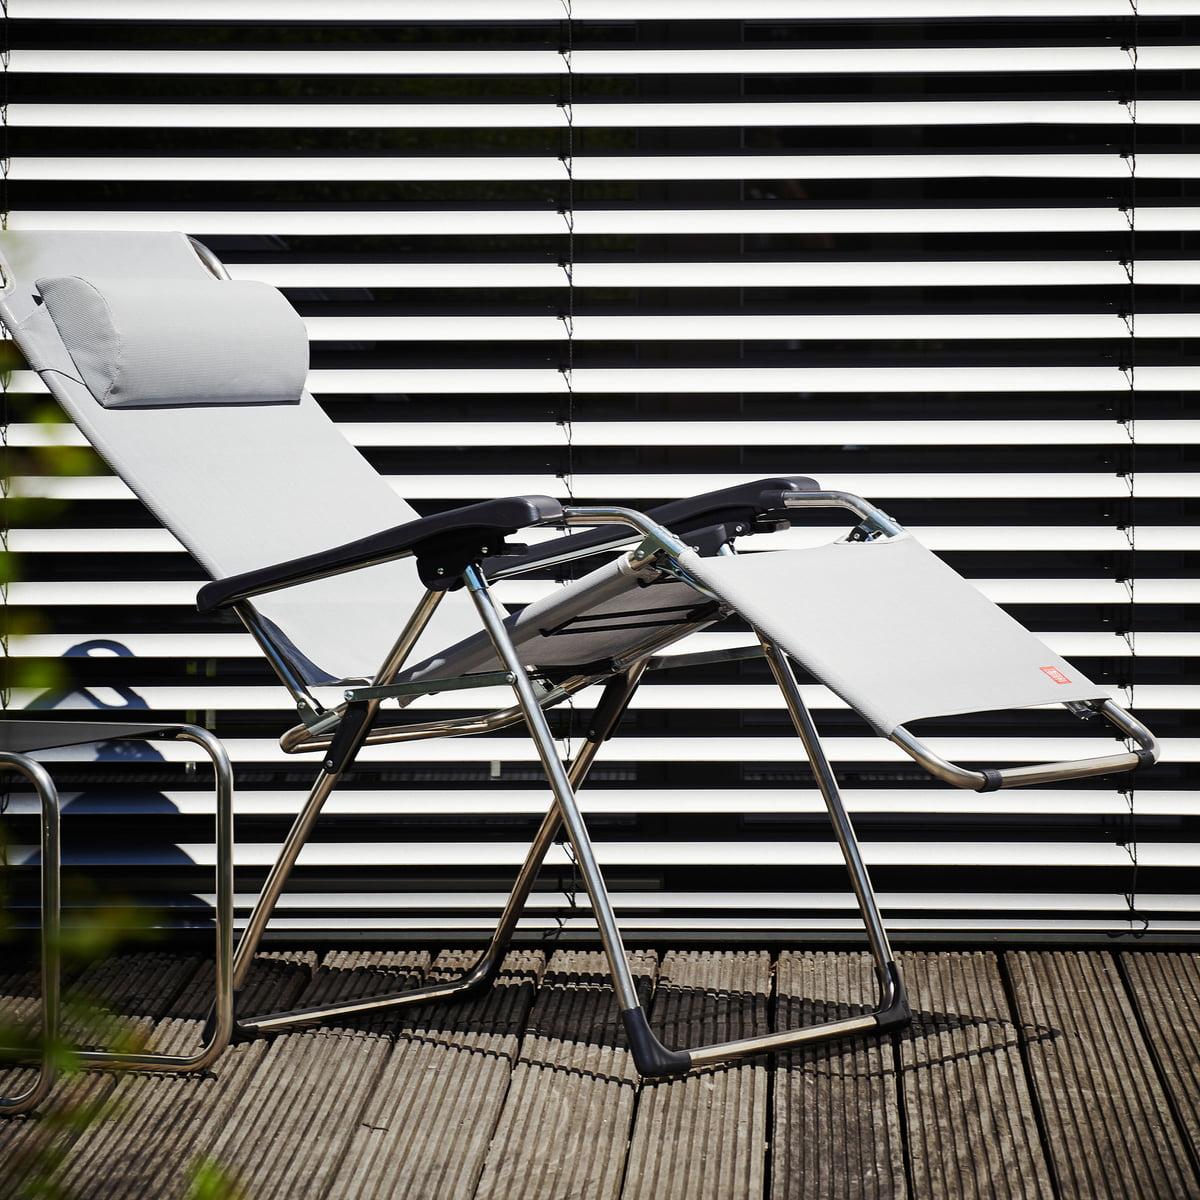 Relaxsessel garten bauhaus  Amida Aluminium Relaxliege von Fiam | Connox